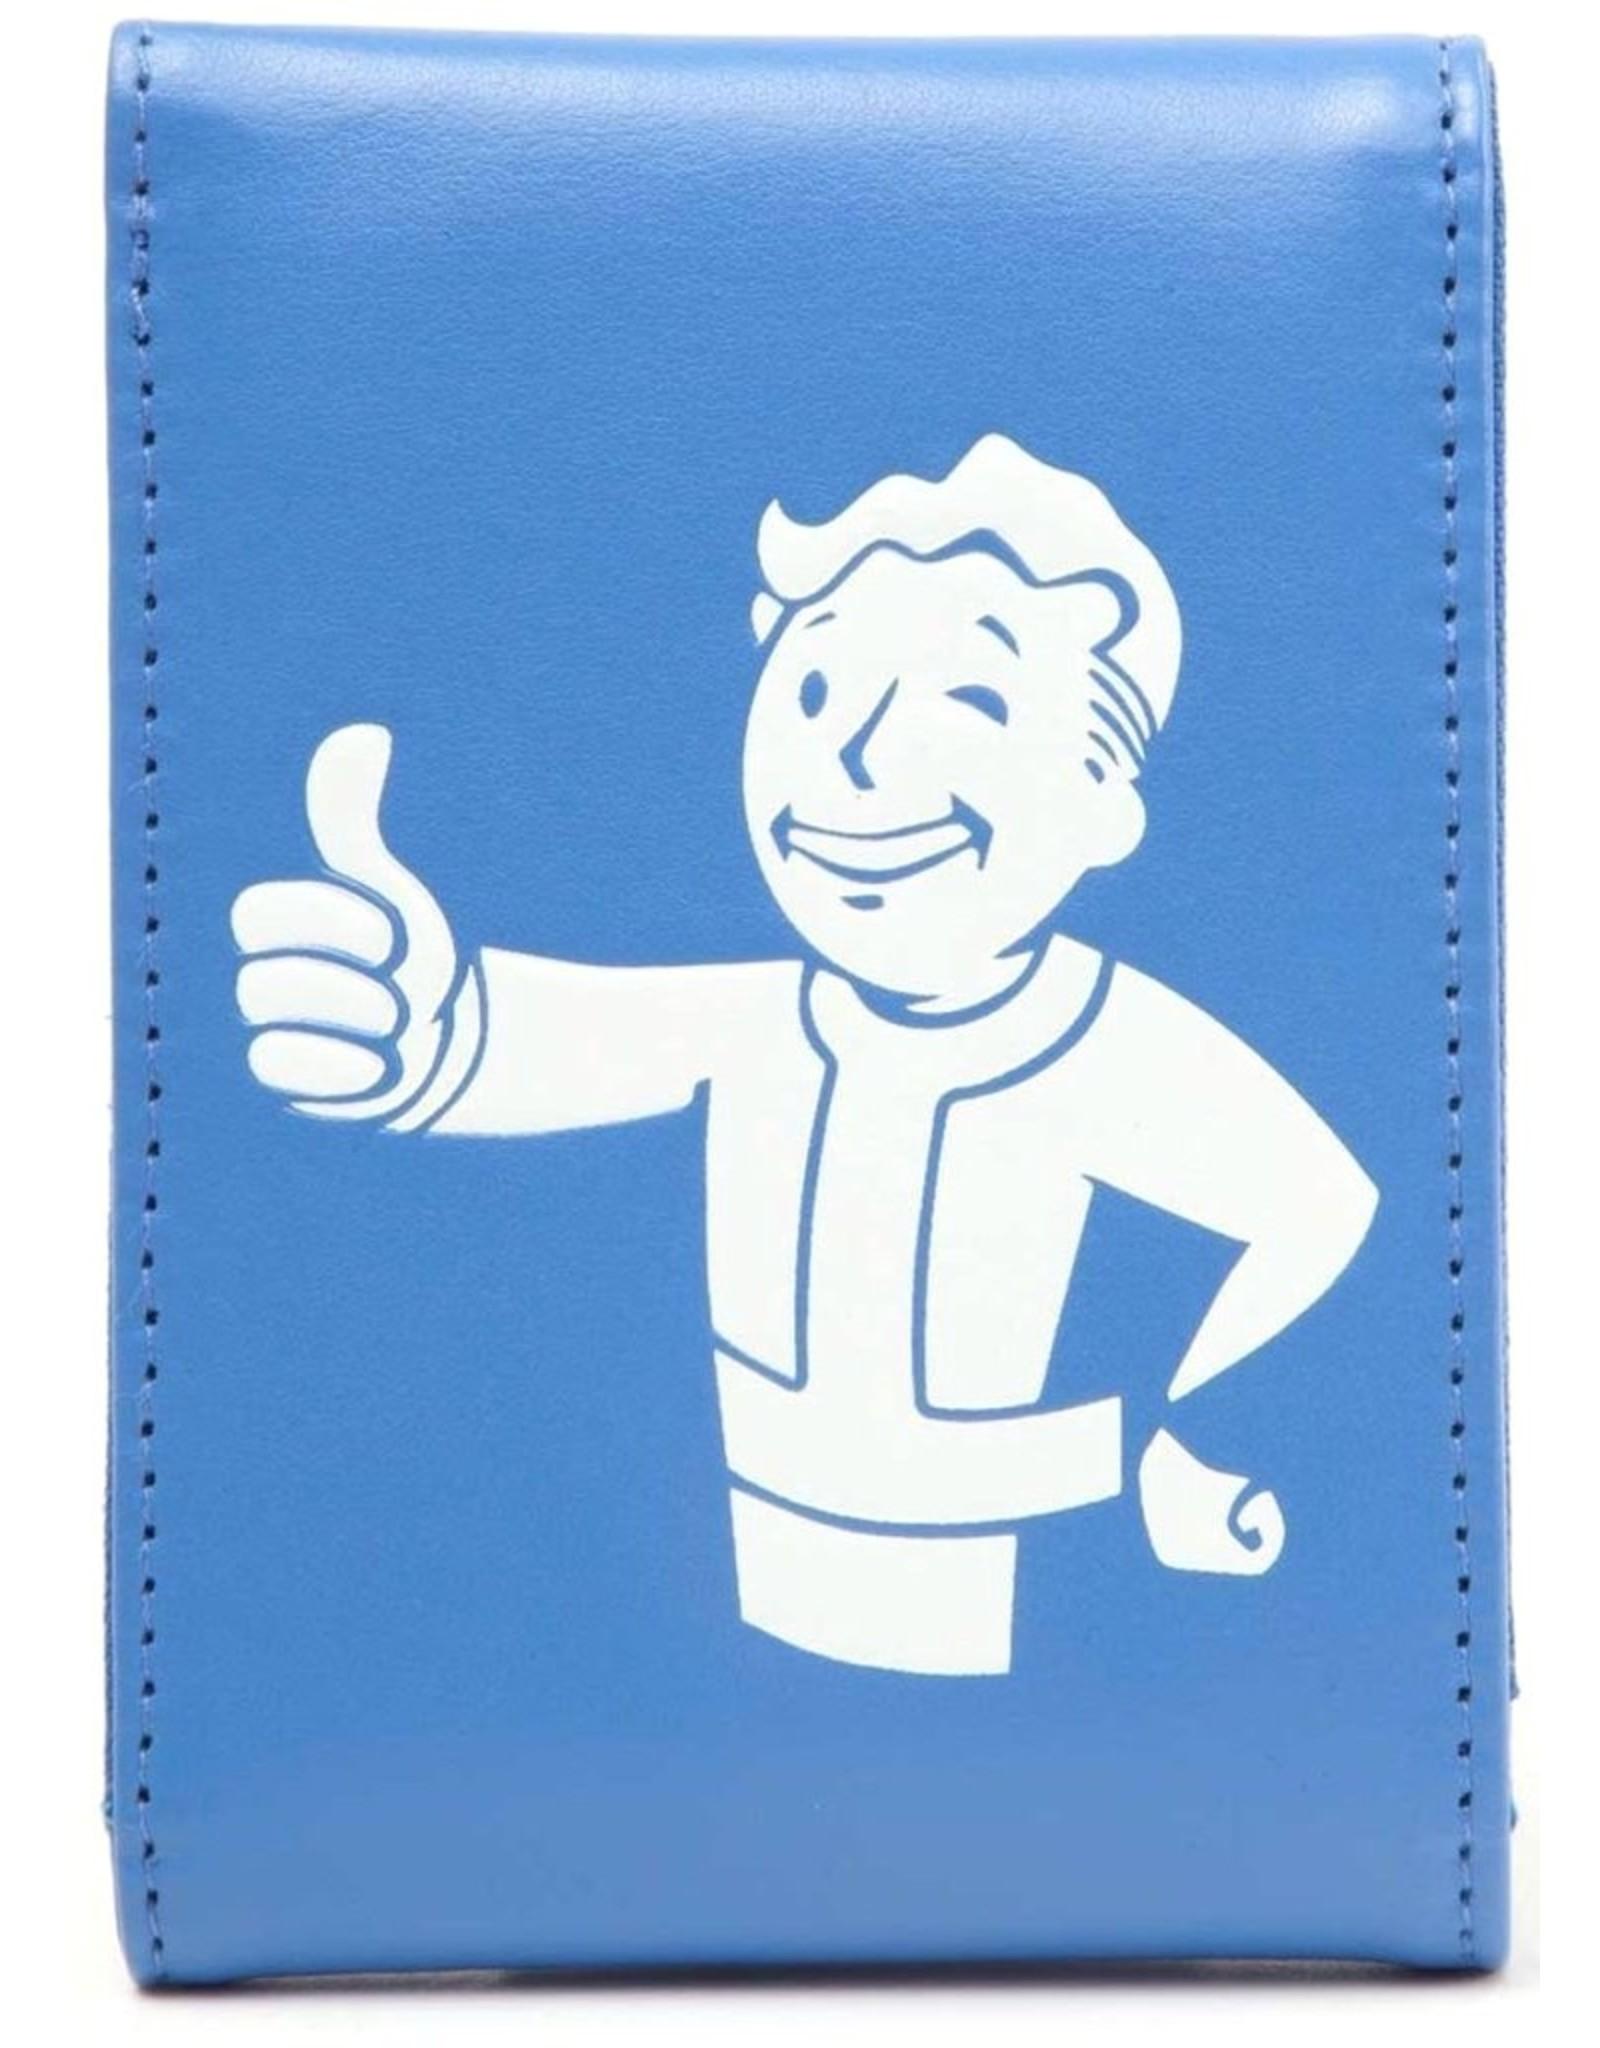 Difuzed Merchandise portemonnees - Vault Boy merchandise portemonnee